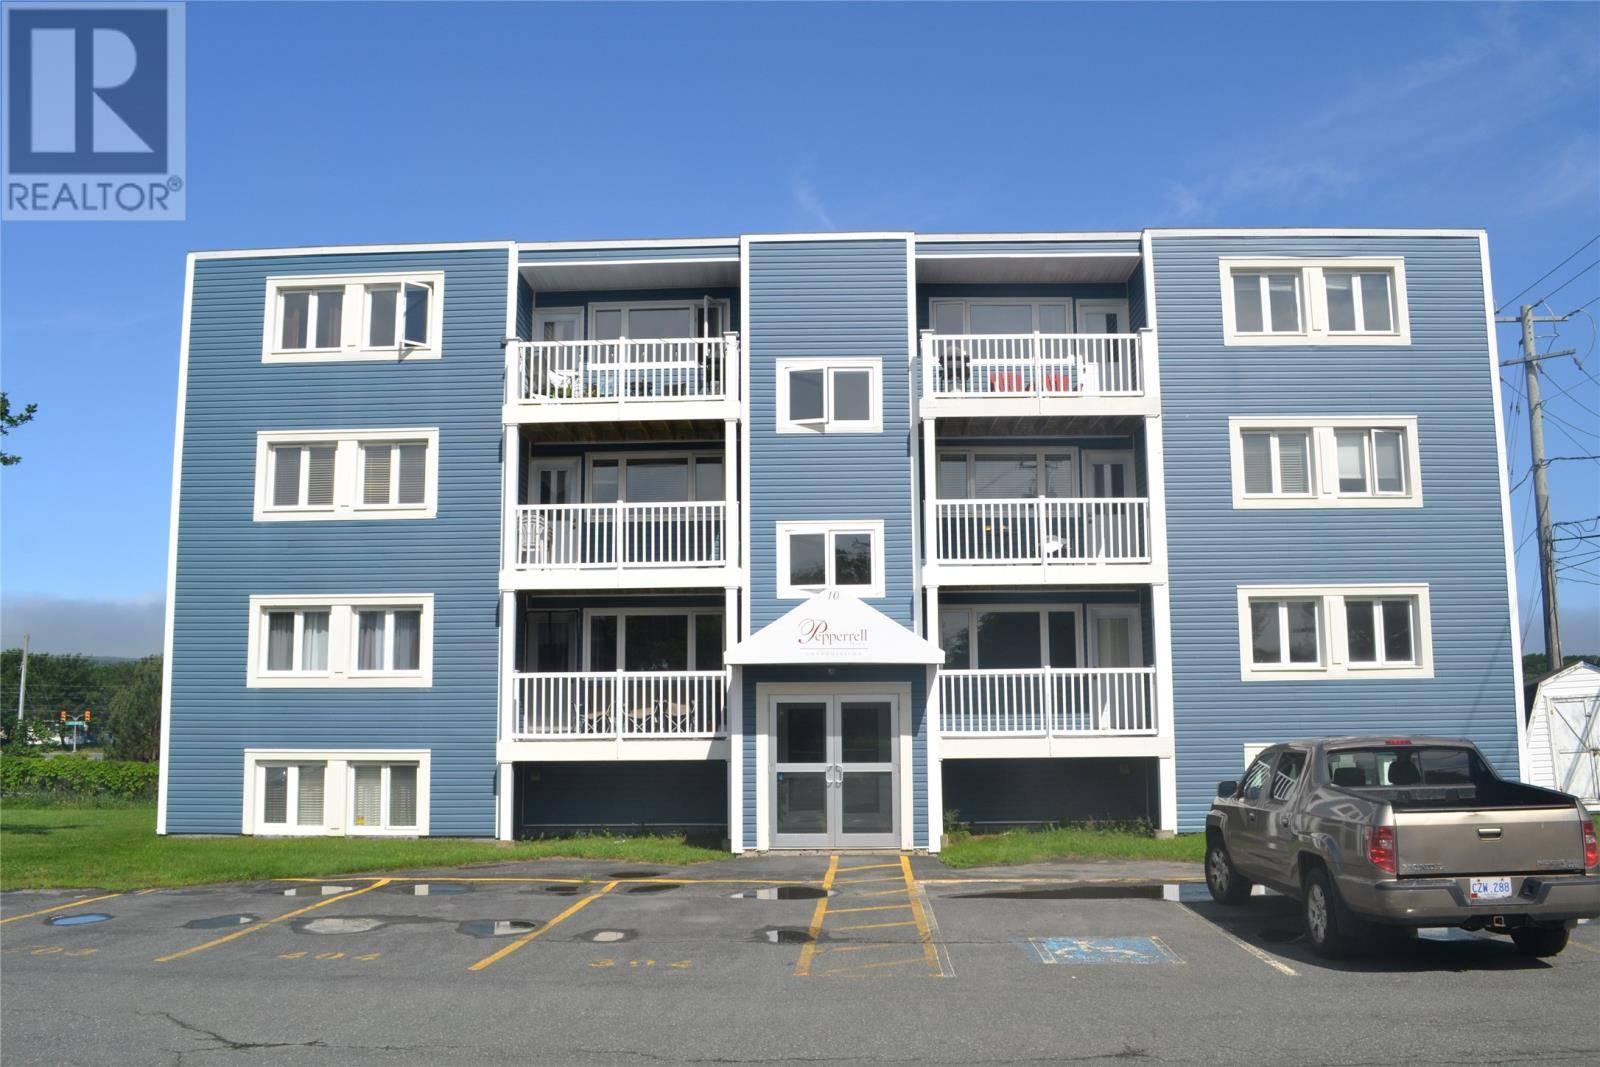 House for sale at 10 Selfridge Rd Unit 303 St. John's Newfoundland - MLS: 1180096